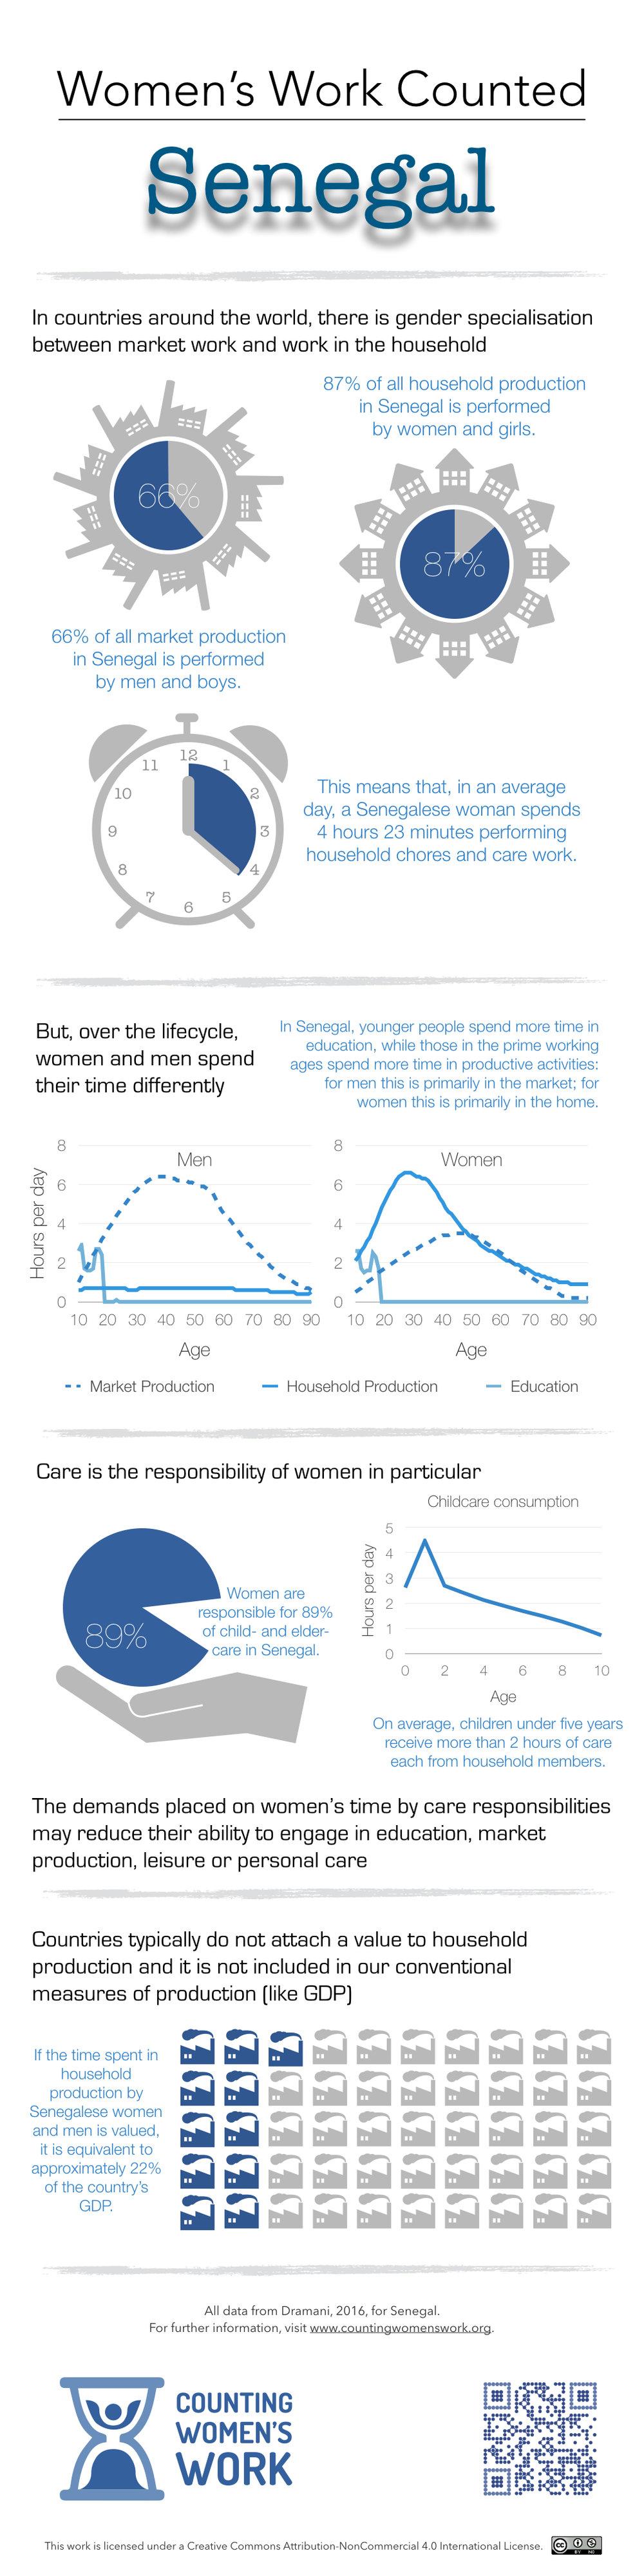 2016-05-24 SN Infographic.001.jpeg